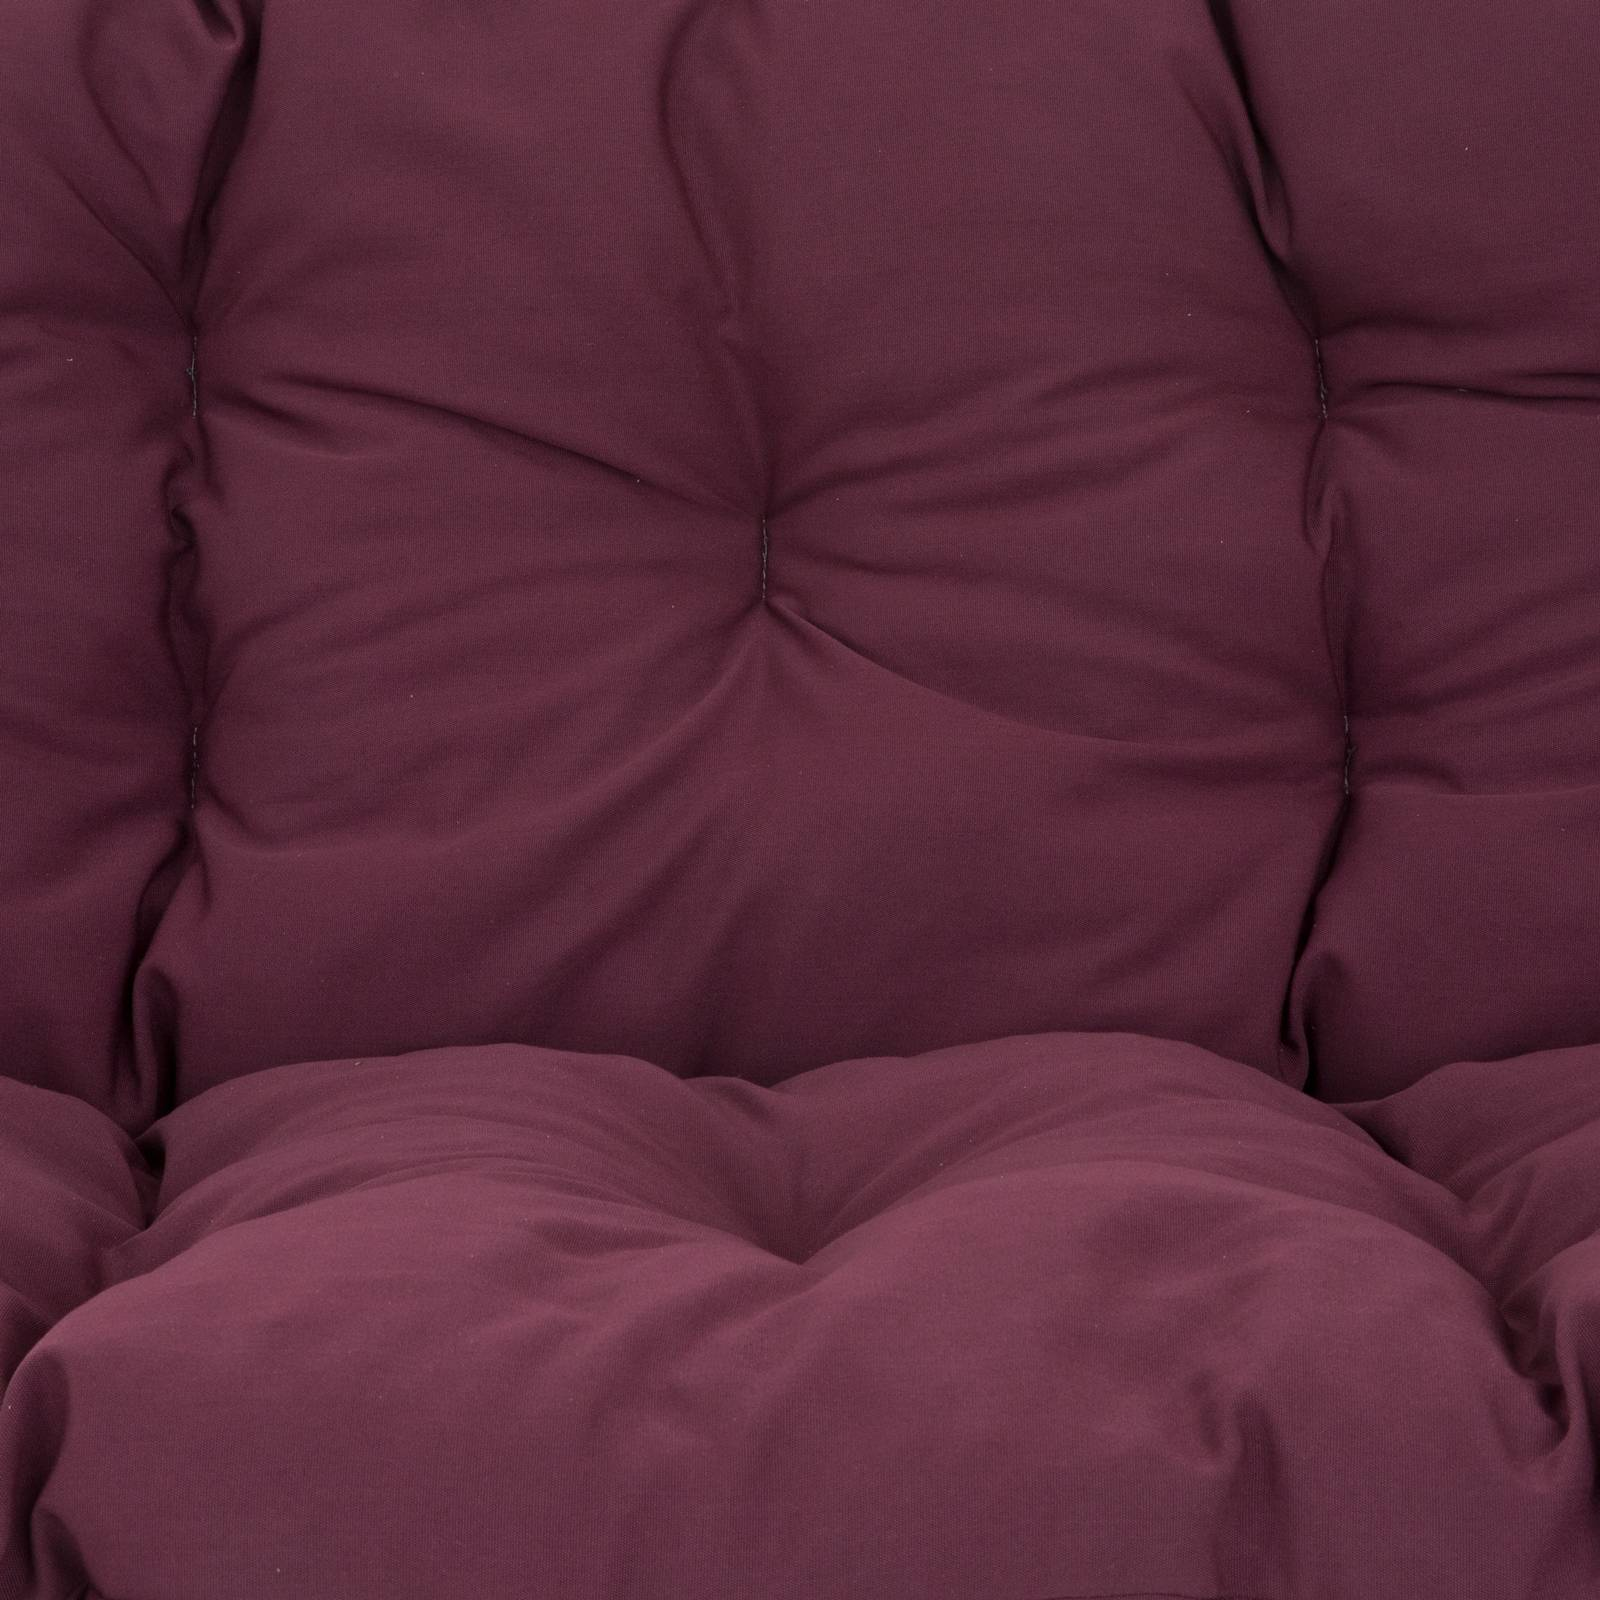 Sedák v kuse na houpačku / lavici Frigiliana D021-03EB PATIO